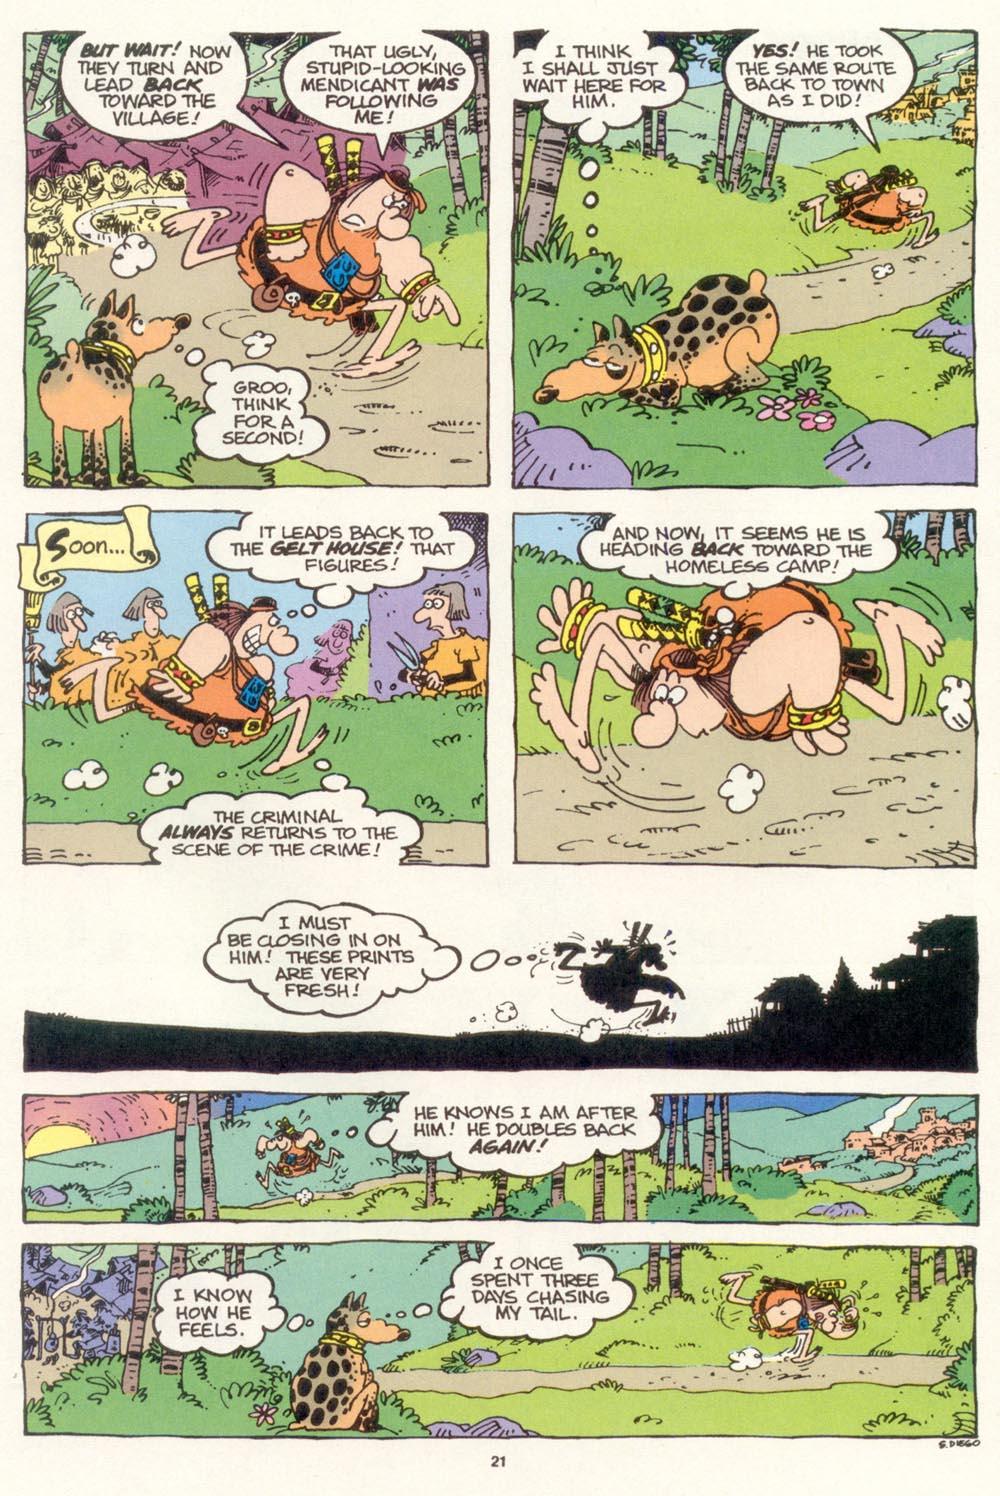 Read online Sergio Aragonés Groo the Wanderer comic -  Issue #118 - 23